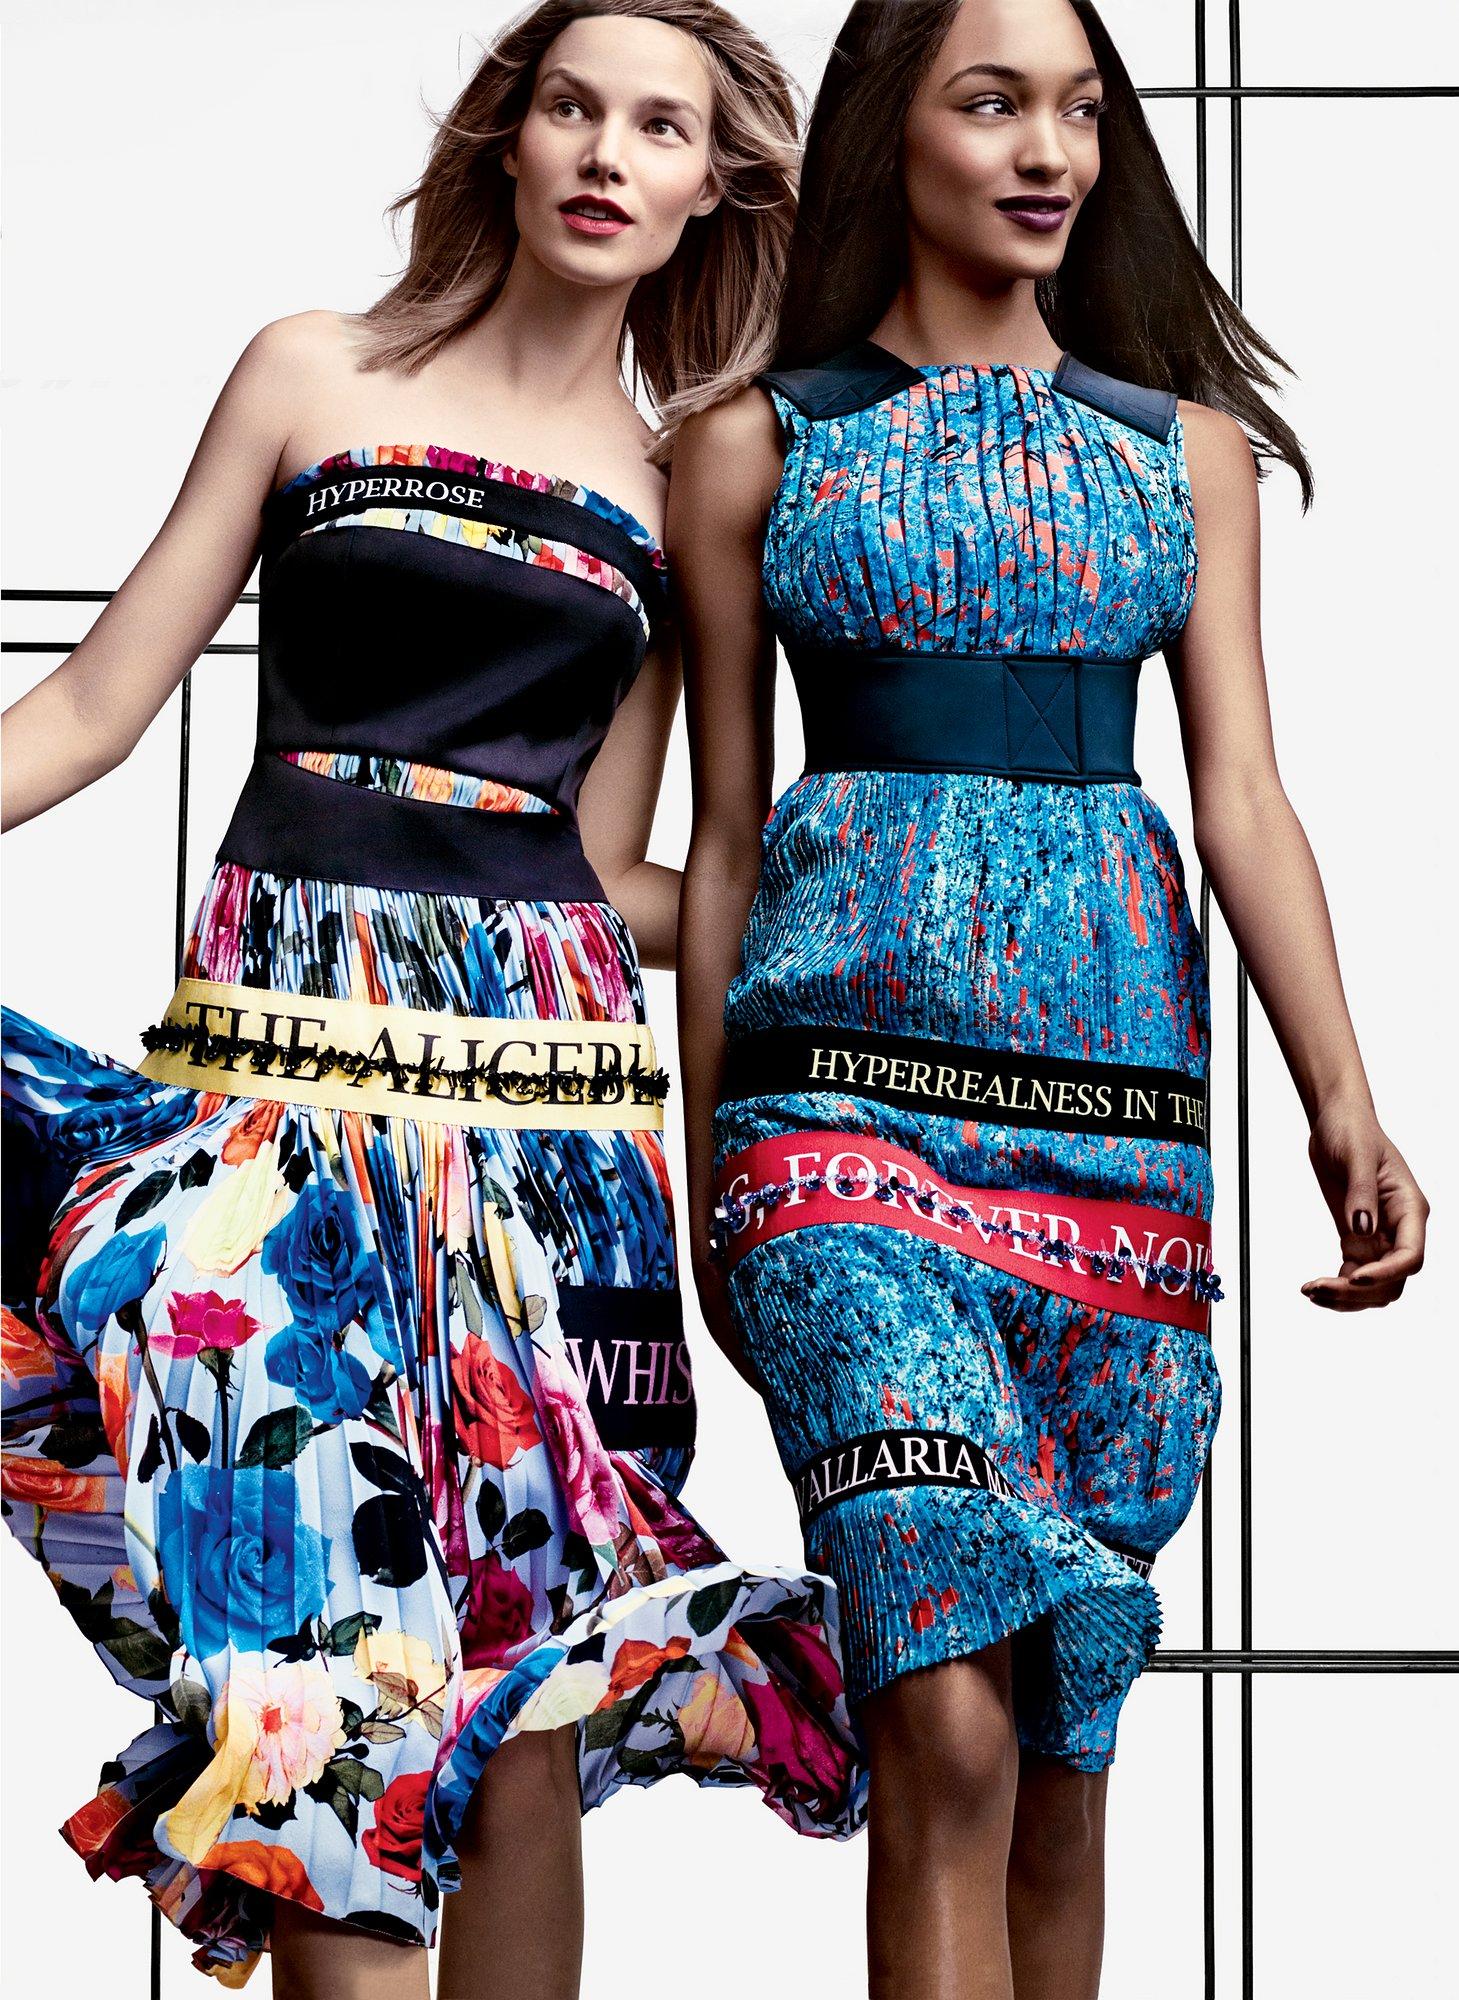 Suvi Koponen and Jourdan Dunn, both in Christian Dior